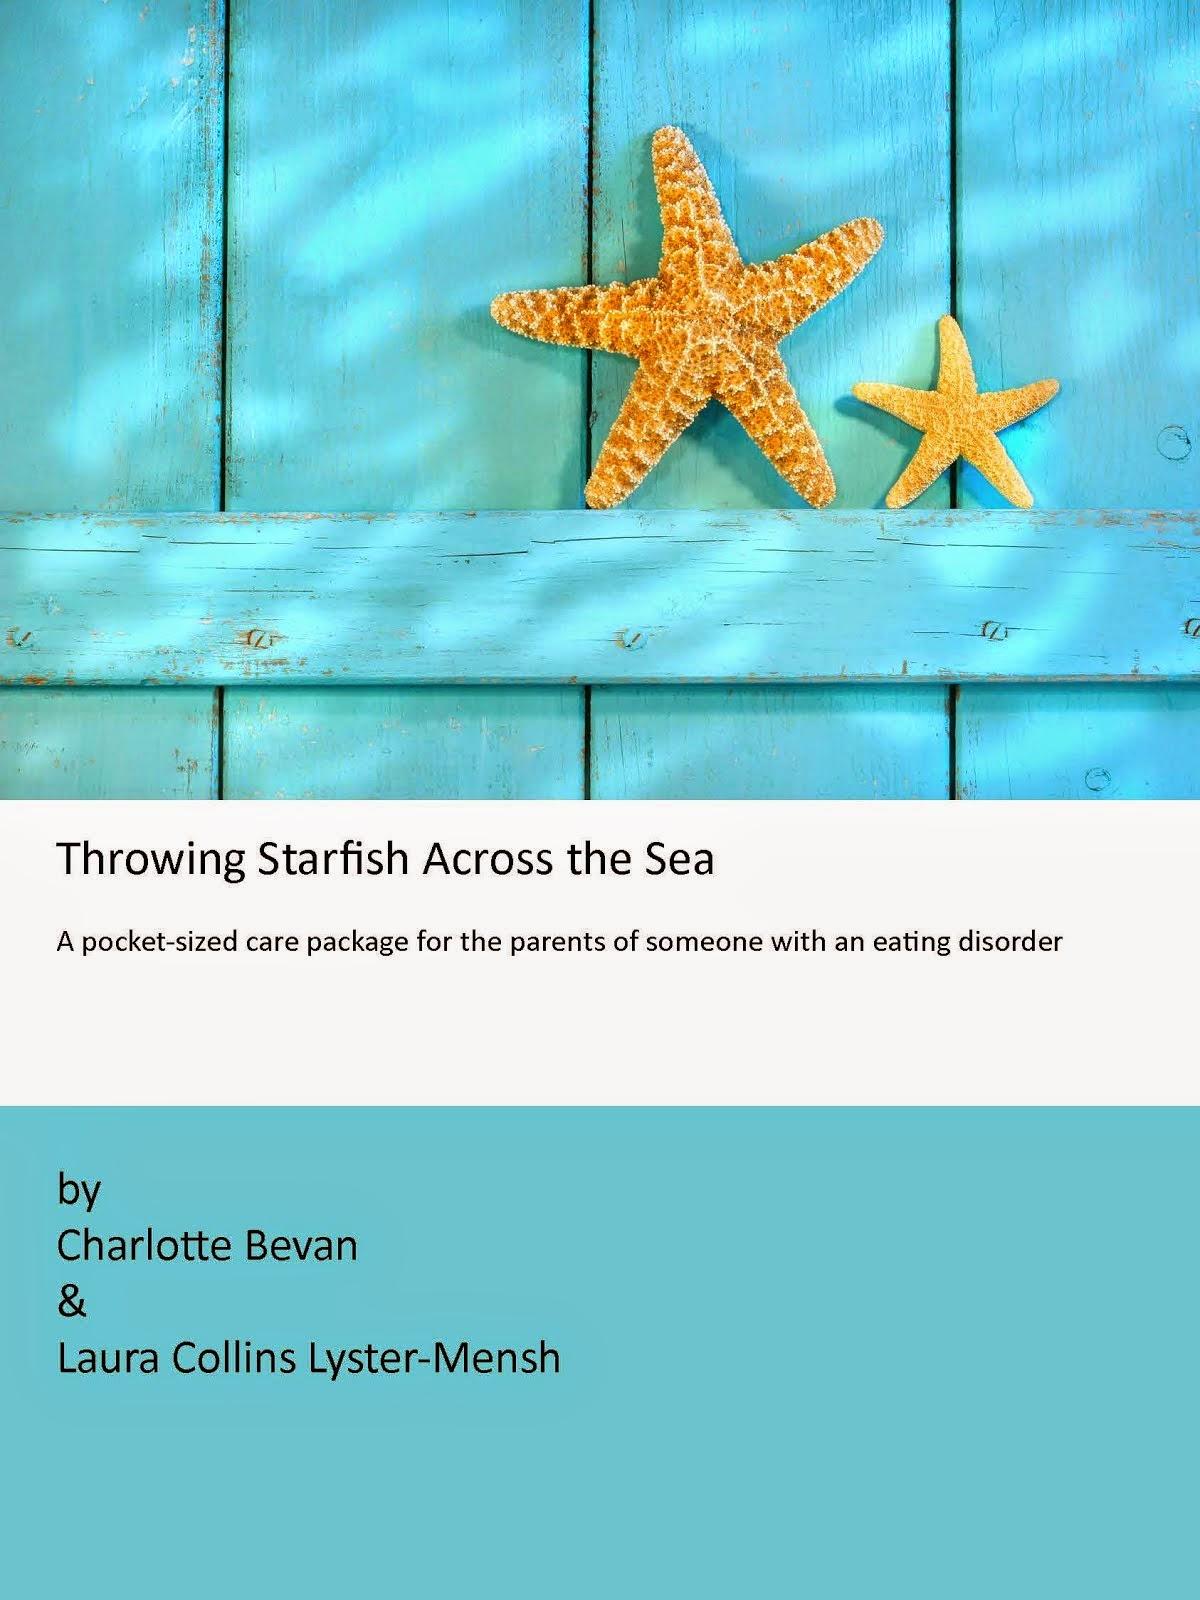 Throwing Starfish Across The Sea